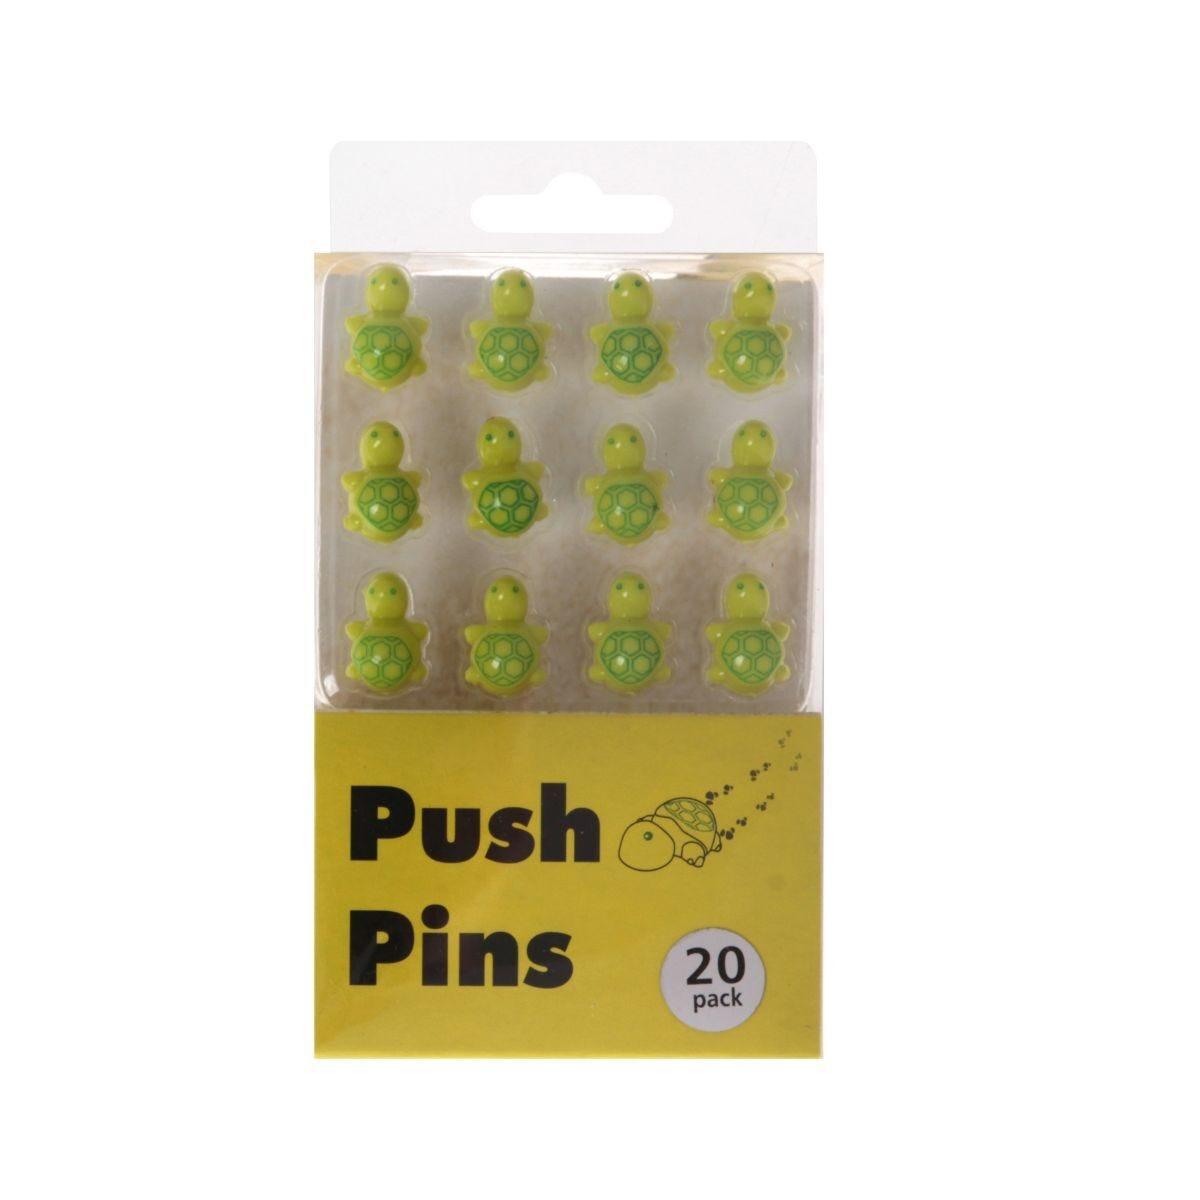 Push Pins Pack of 20 Turtles